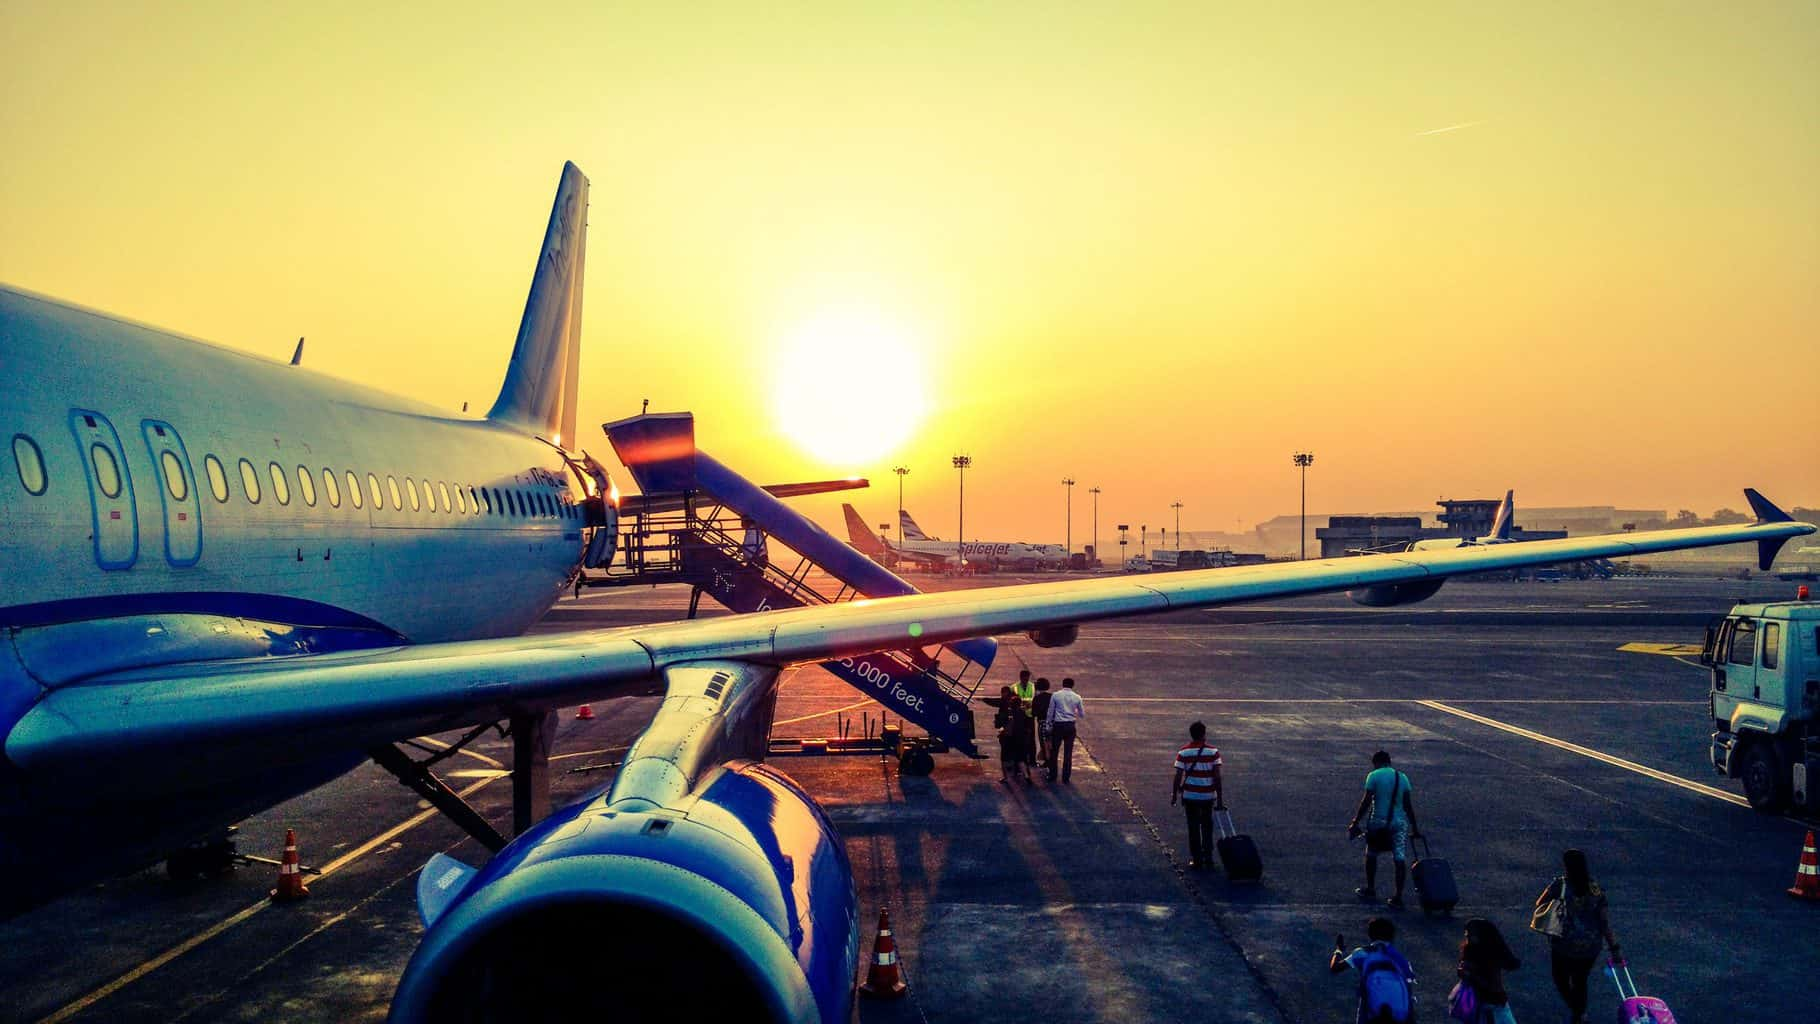 The Best Ways to Plan Cheap Weekend Getaways